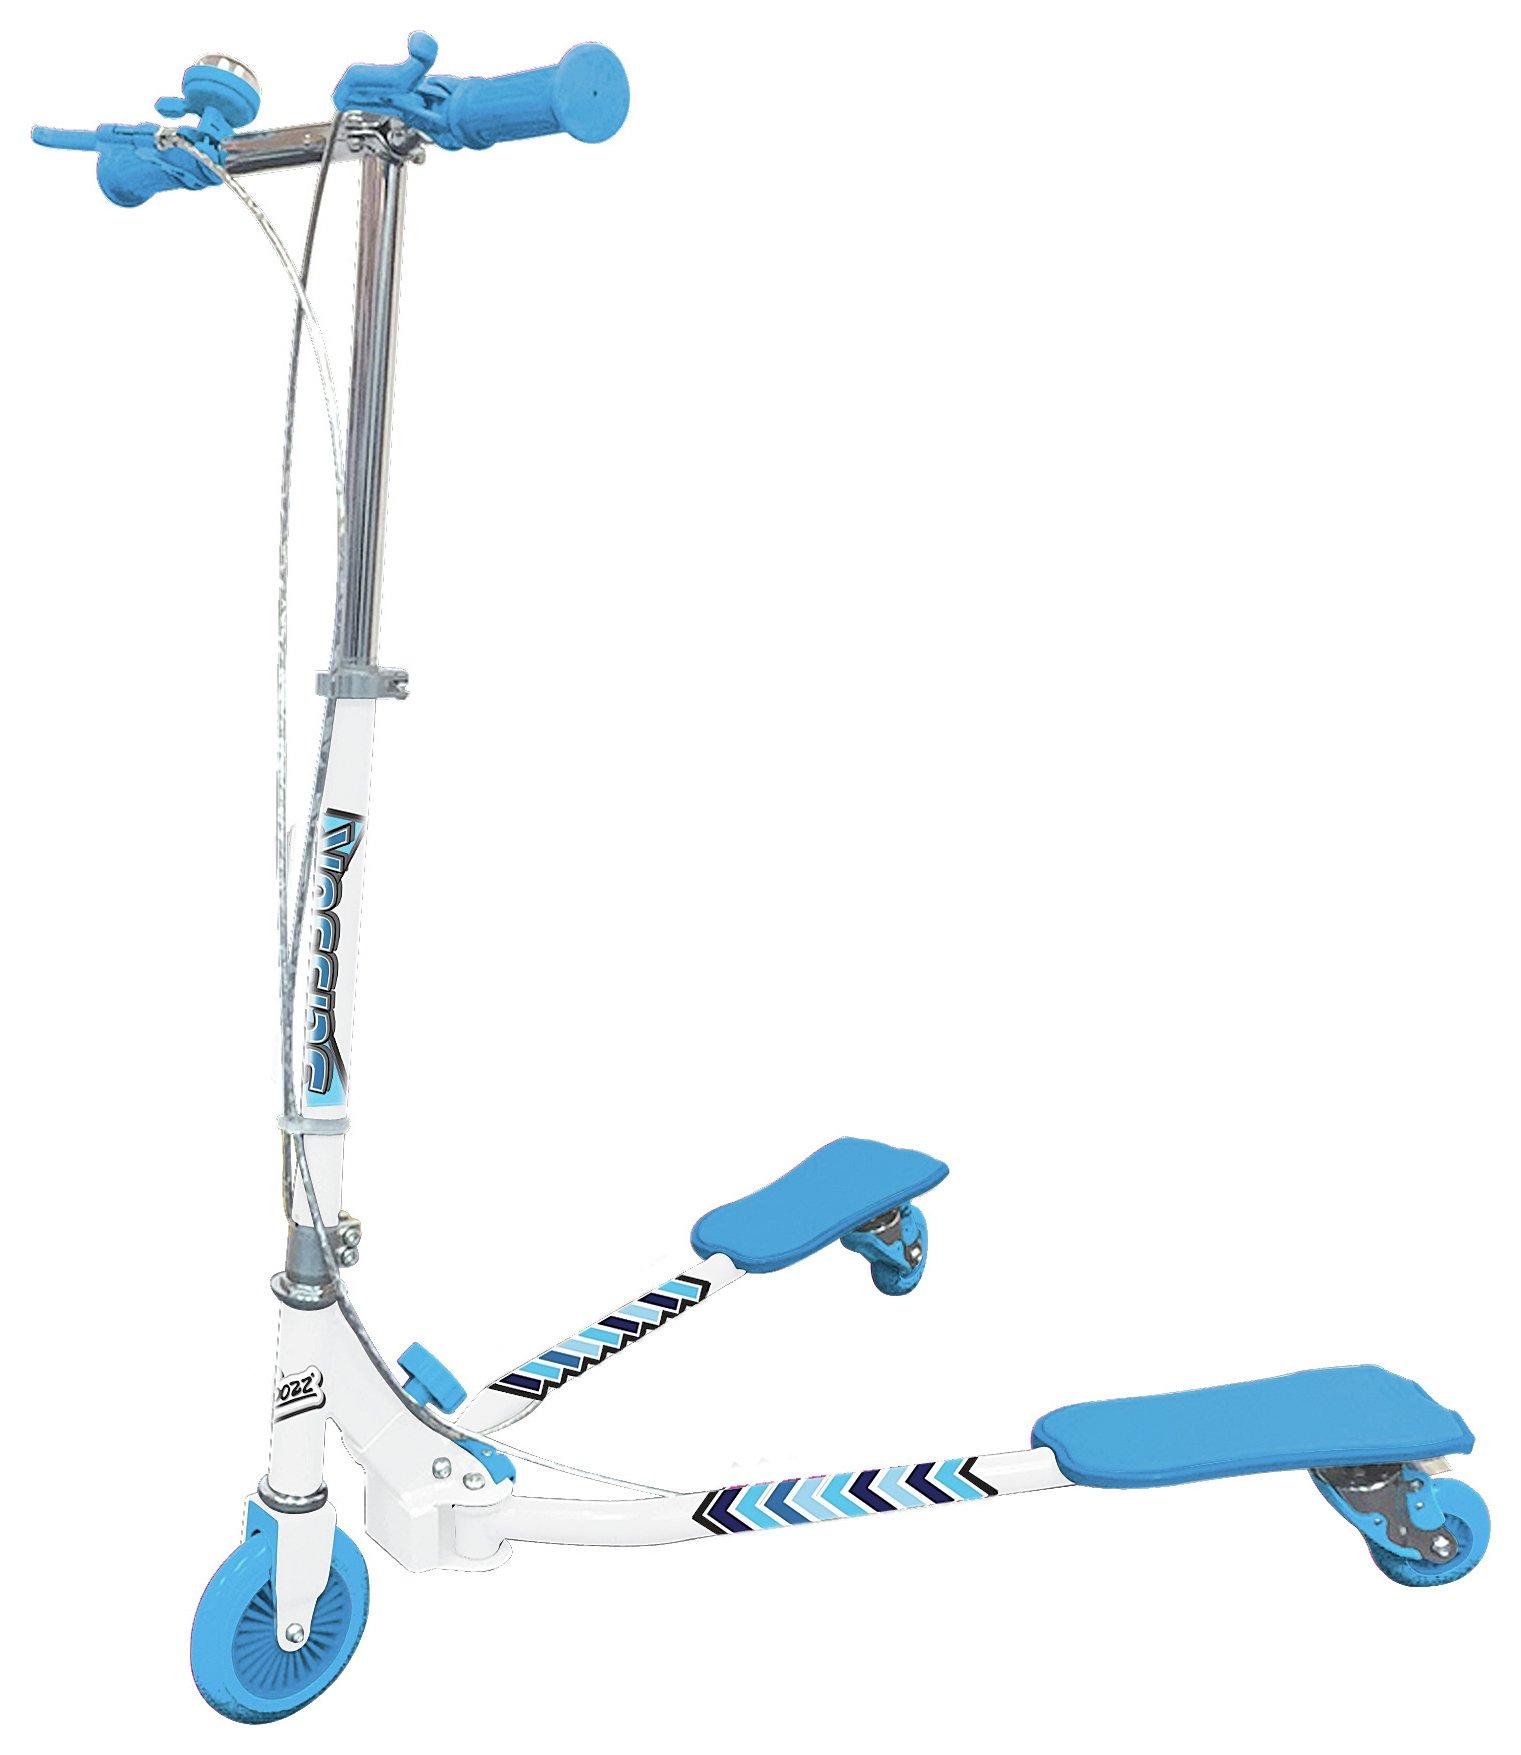 Buy Ozbozz Scissor Scooter Blue Scooters Argos